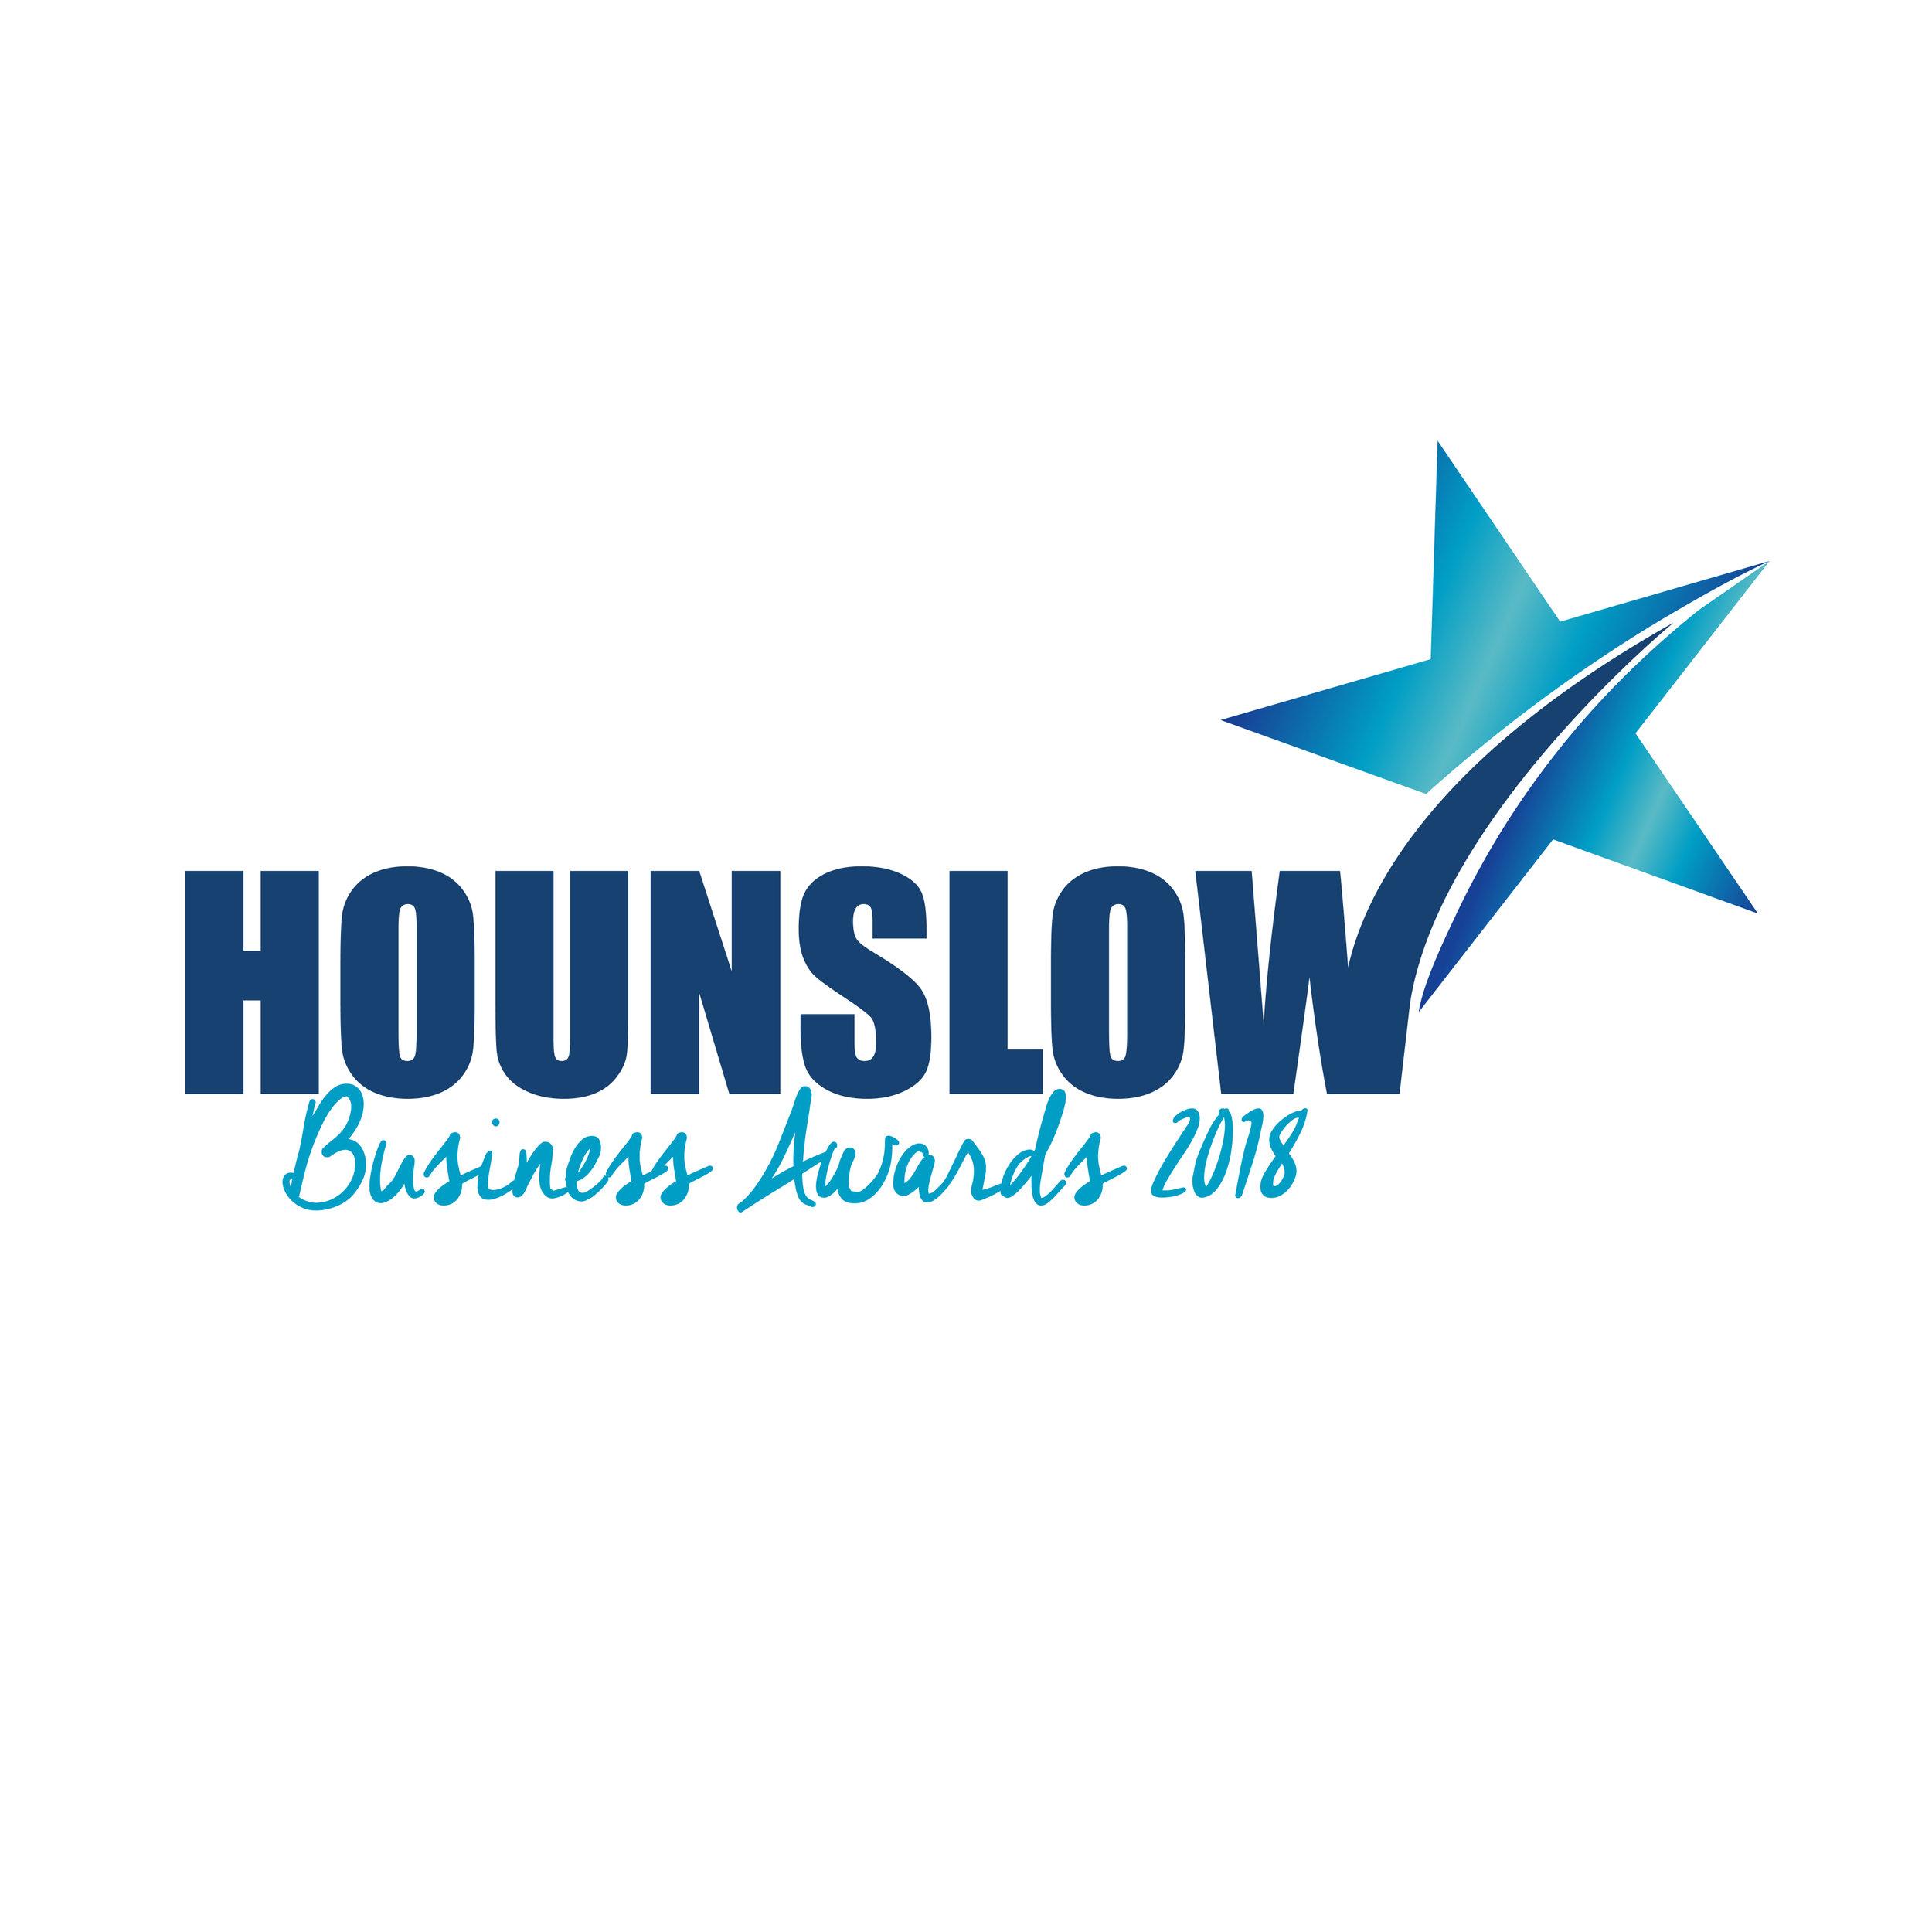 Hounslow business award logo 2018 SQ.jpg